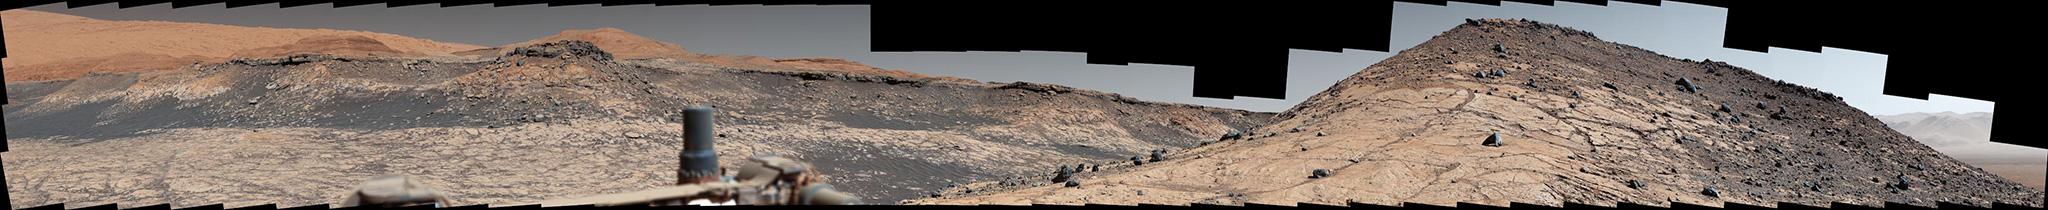 Un Western Spaghetti sur Mars